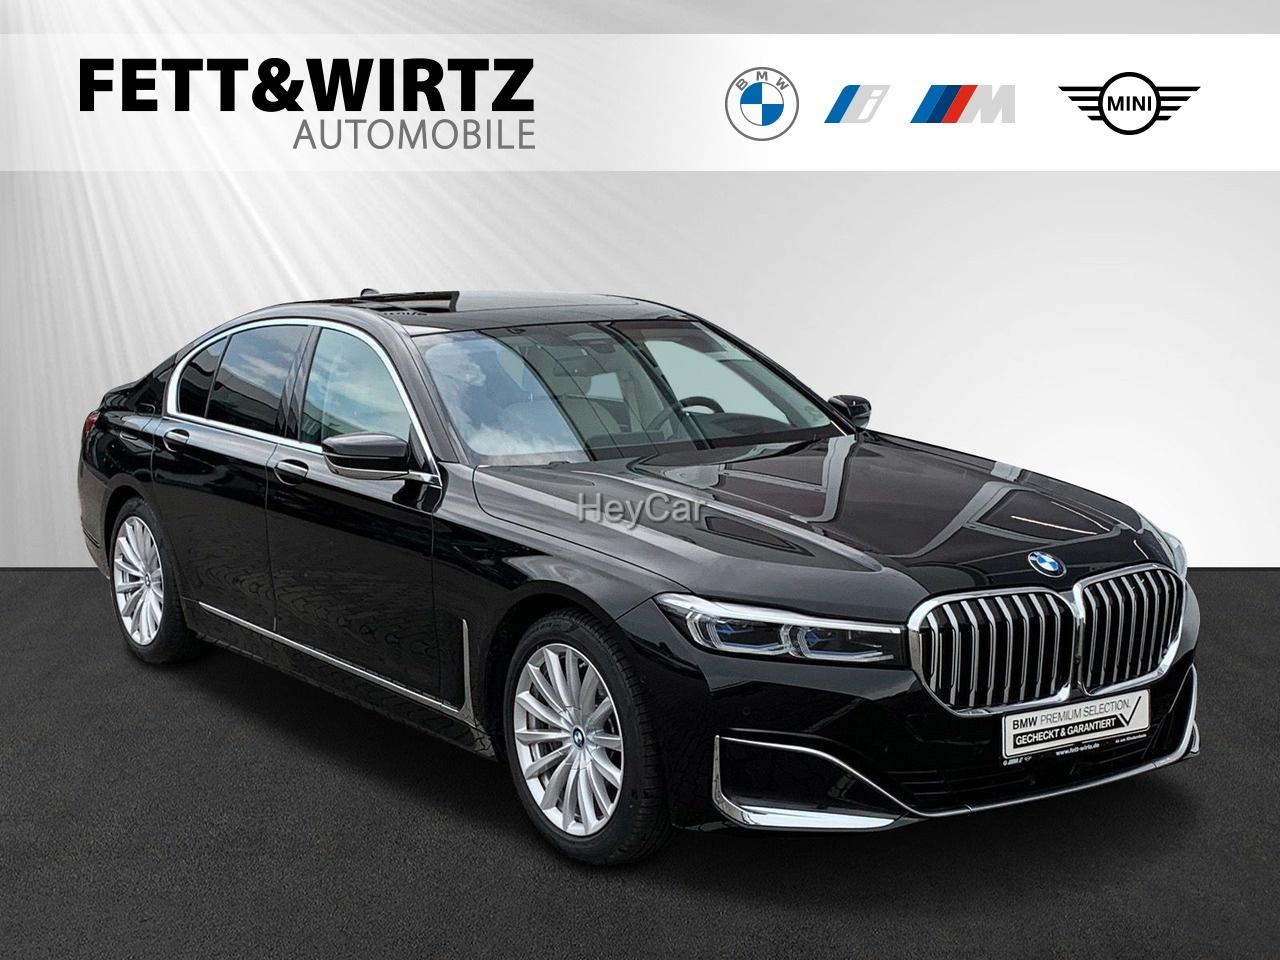 BMW 745e TV+ Massage elektr. GSD HUD Live Cockpit, Jahr 2020, Hybrid